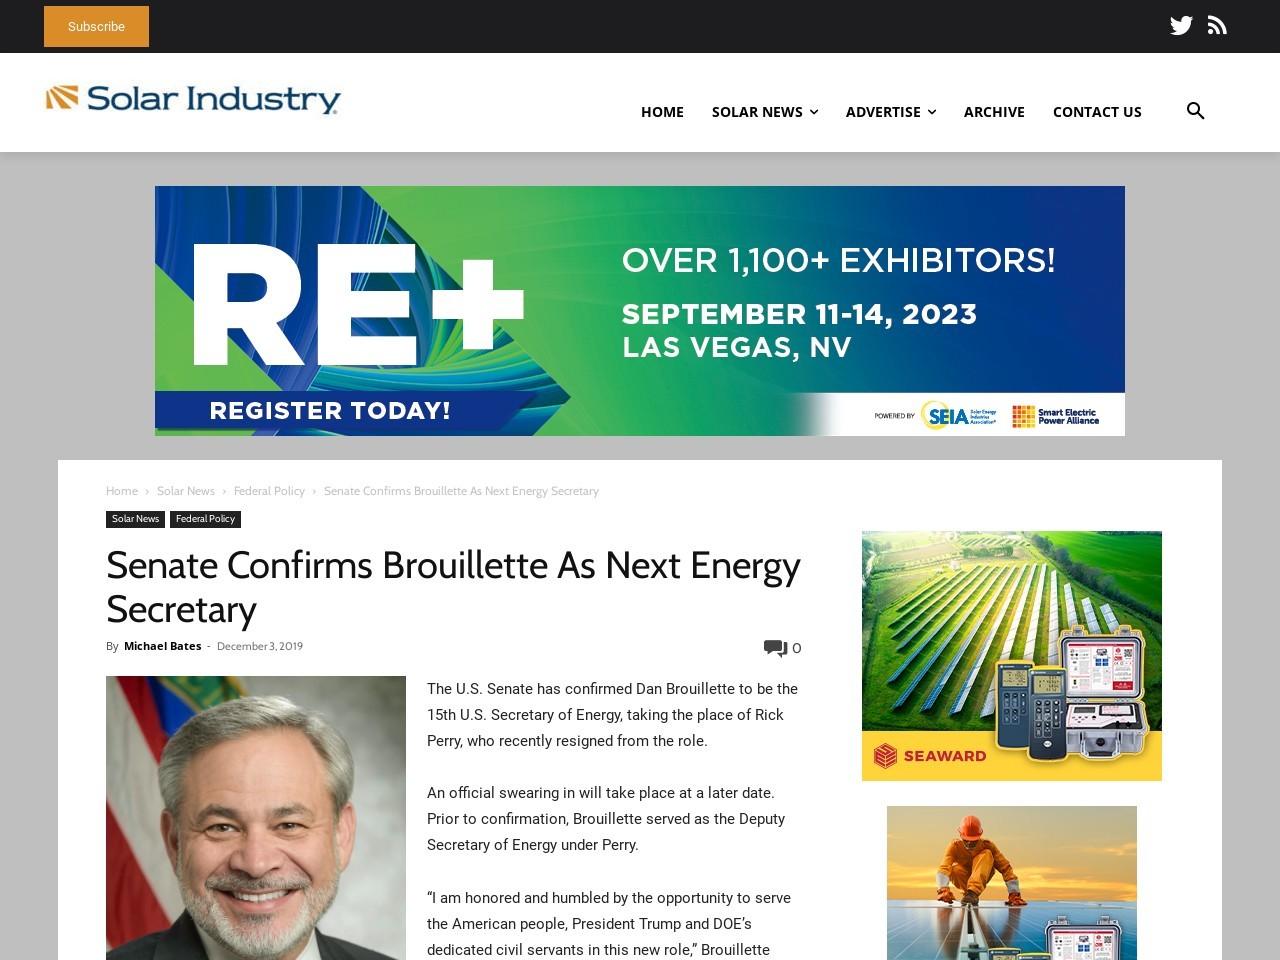 Senate Confirms Brouillette As Next Energy Secretary